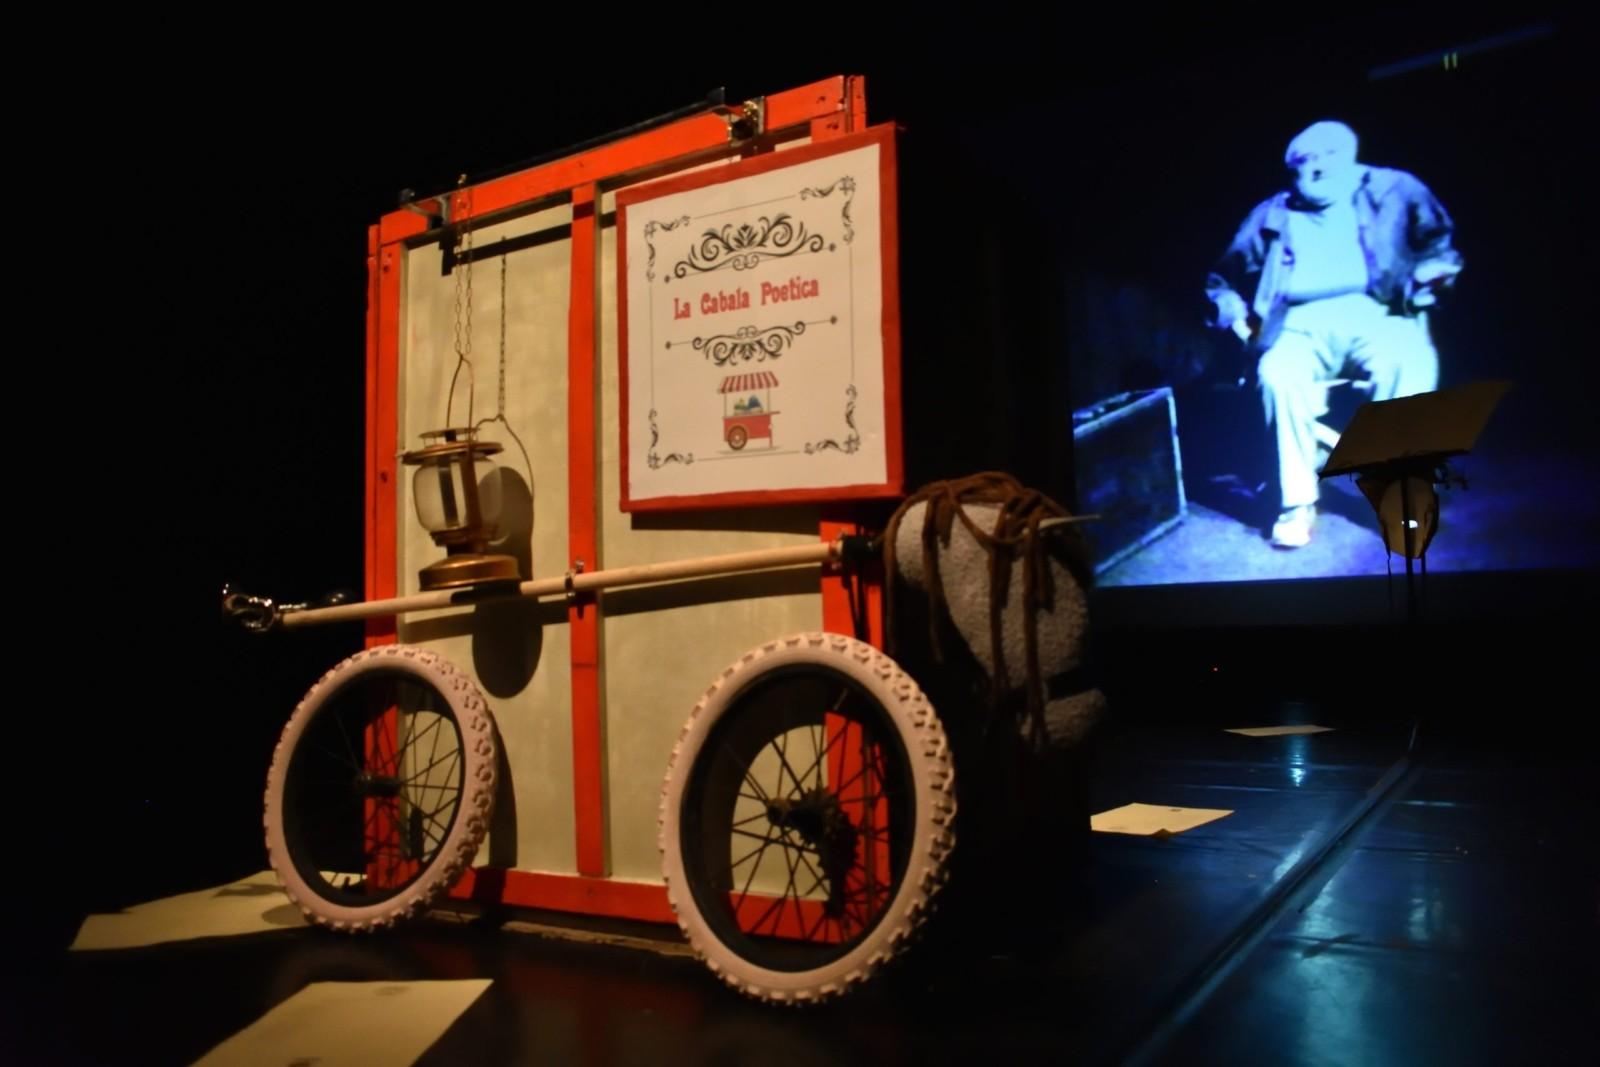 Il jukebox delle poesie - 39